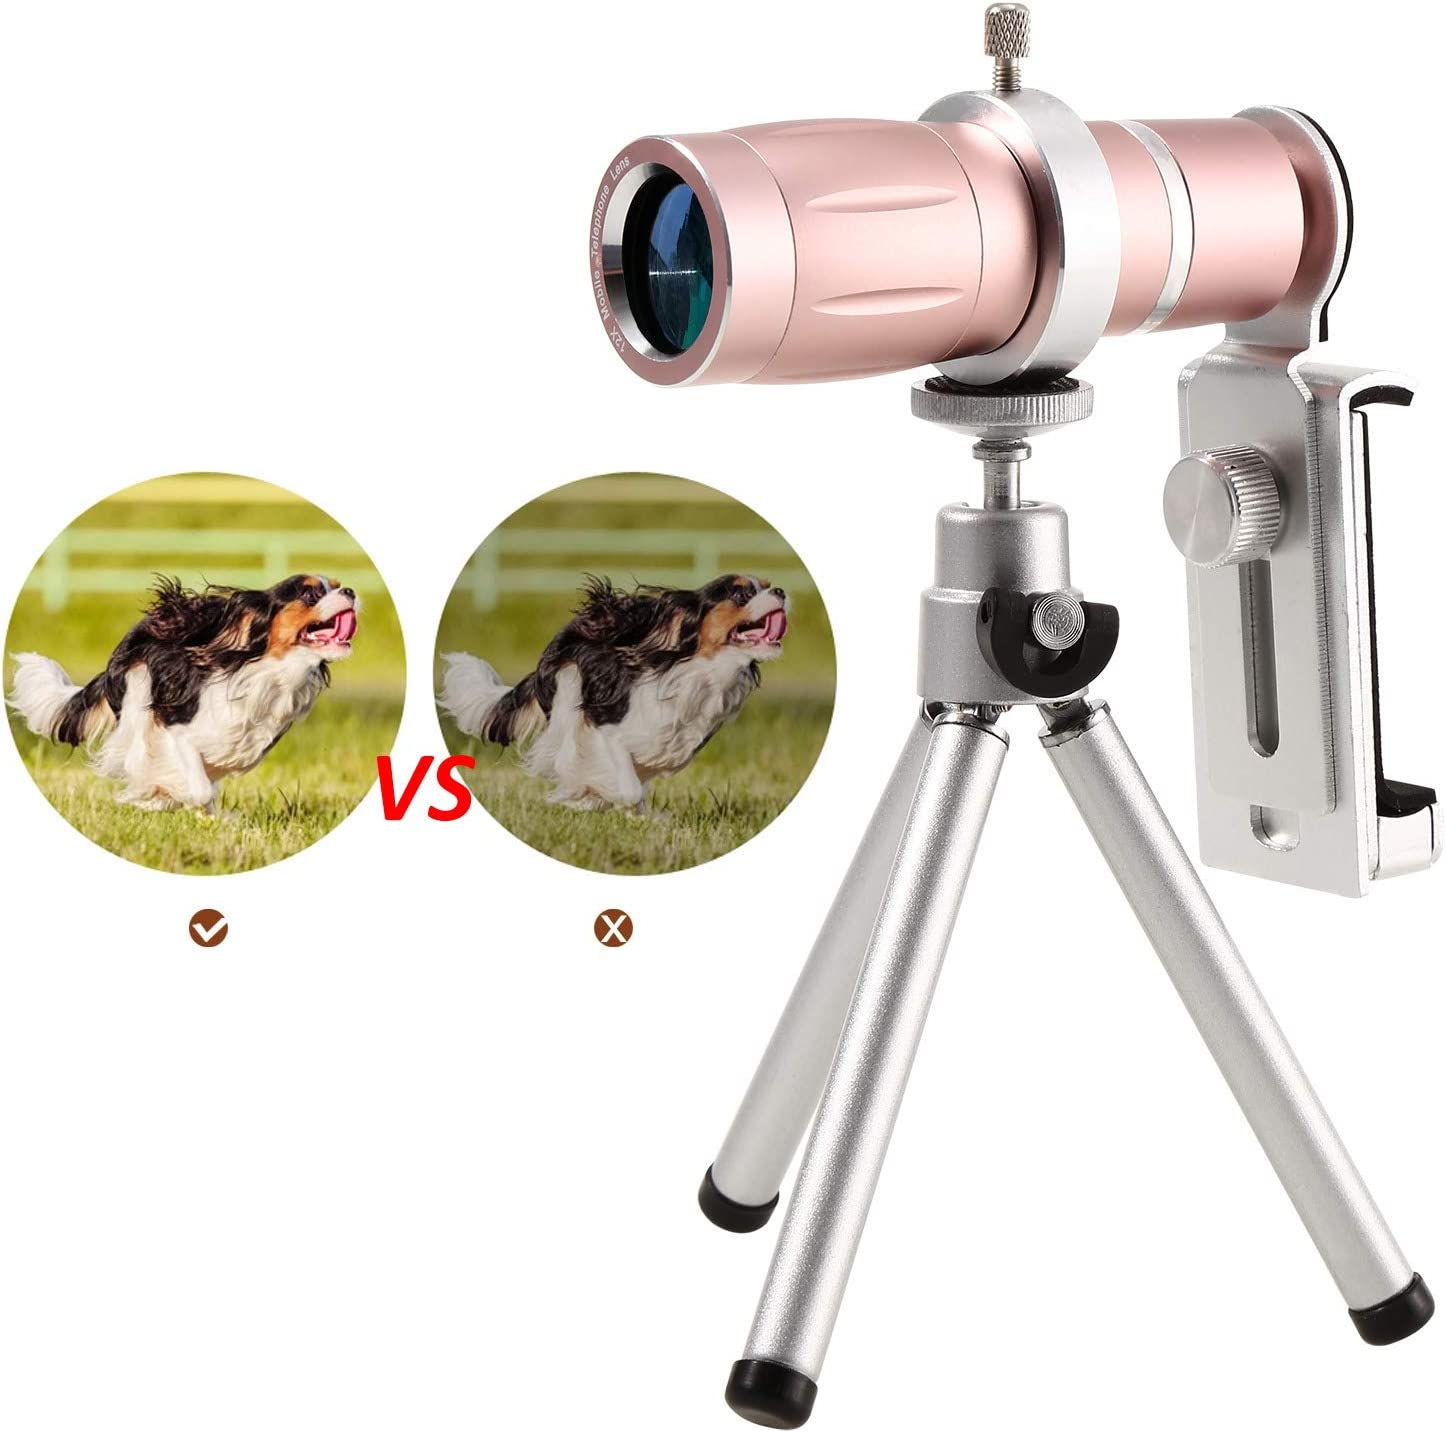 Meiifes Handy Objektiv Kamera Objektiv Universal 12x Zoom Teleobjektiv Fisheye Objektiv Objektiv Kamera Linse Kit Mini Erweiterbar Stativ Kameraobjektiv Set f/ür Smartphones A